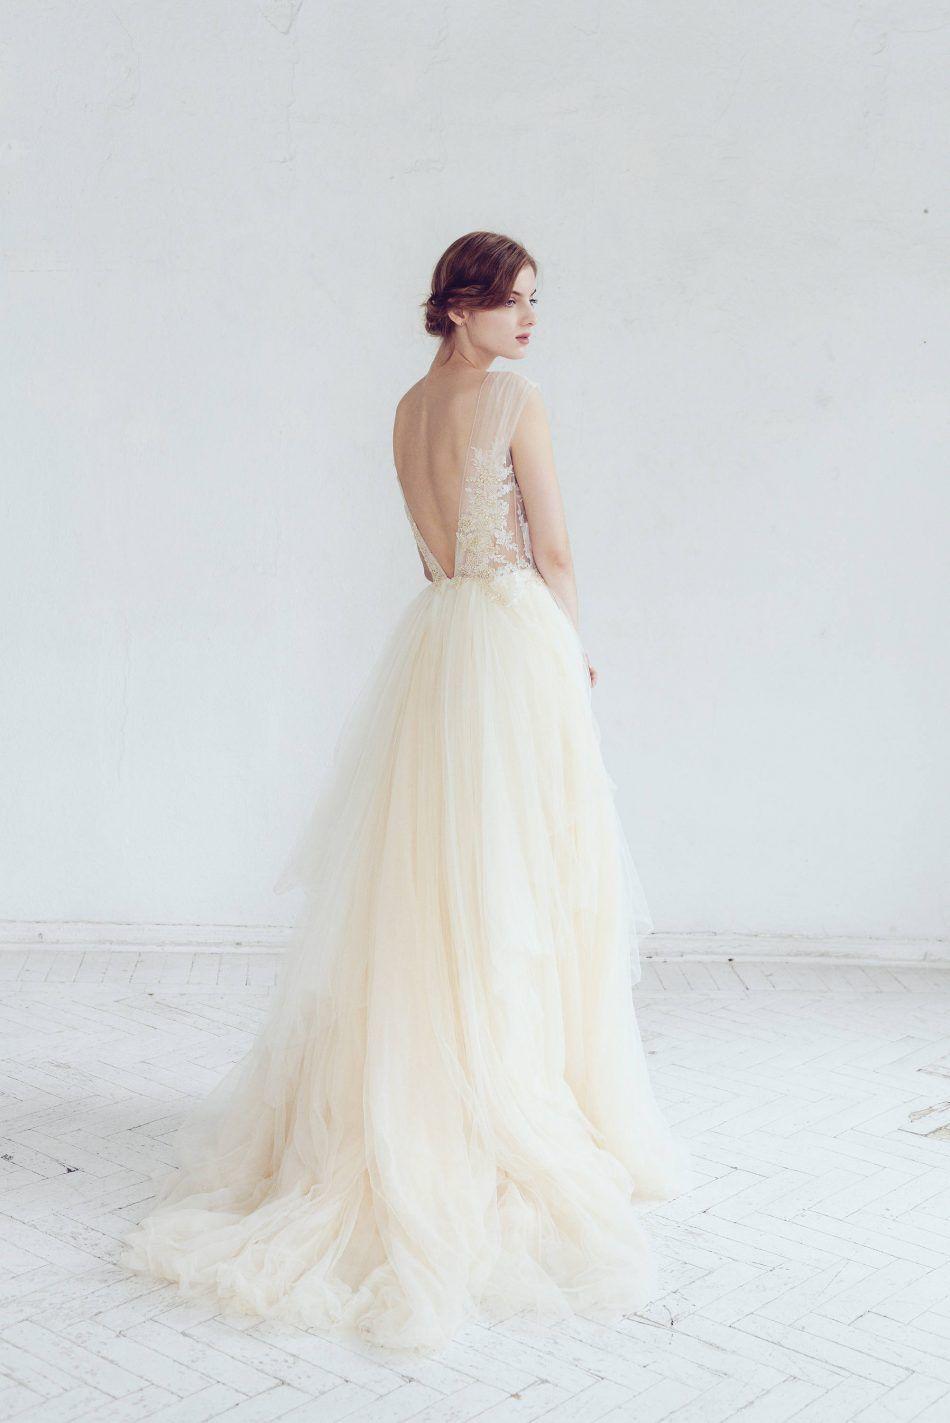 Champagne & Ivory Tulle Wedding Dress